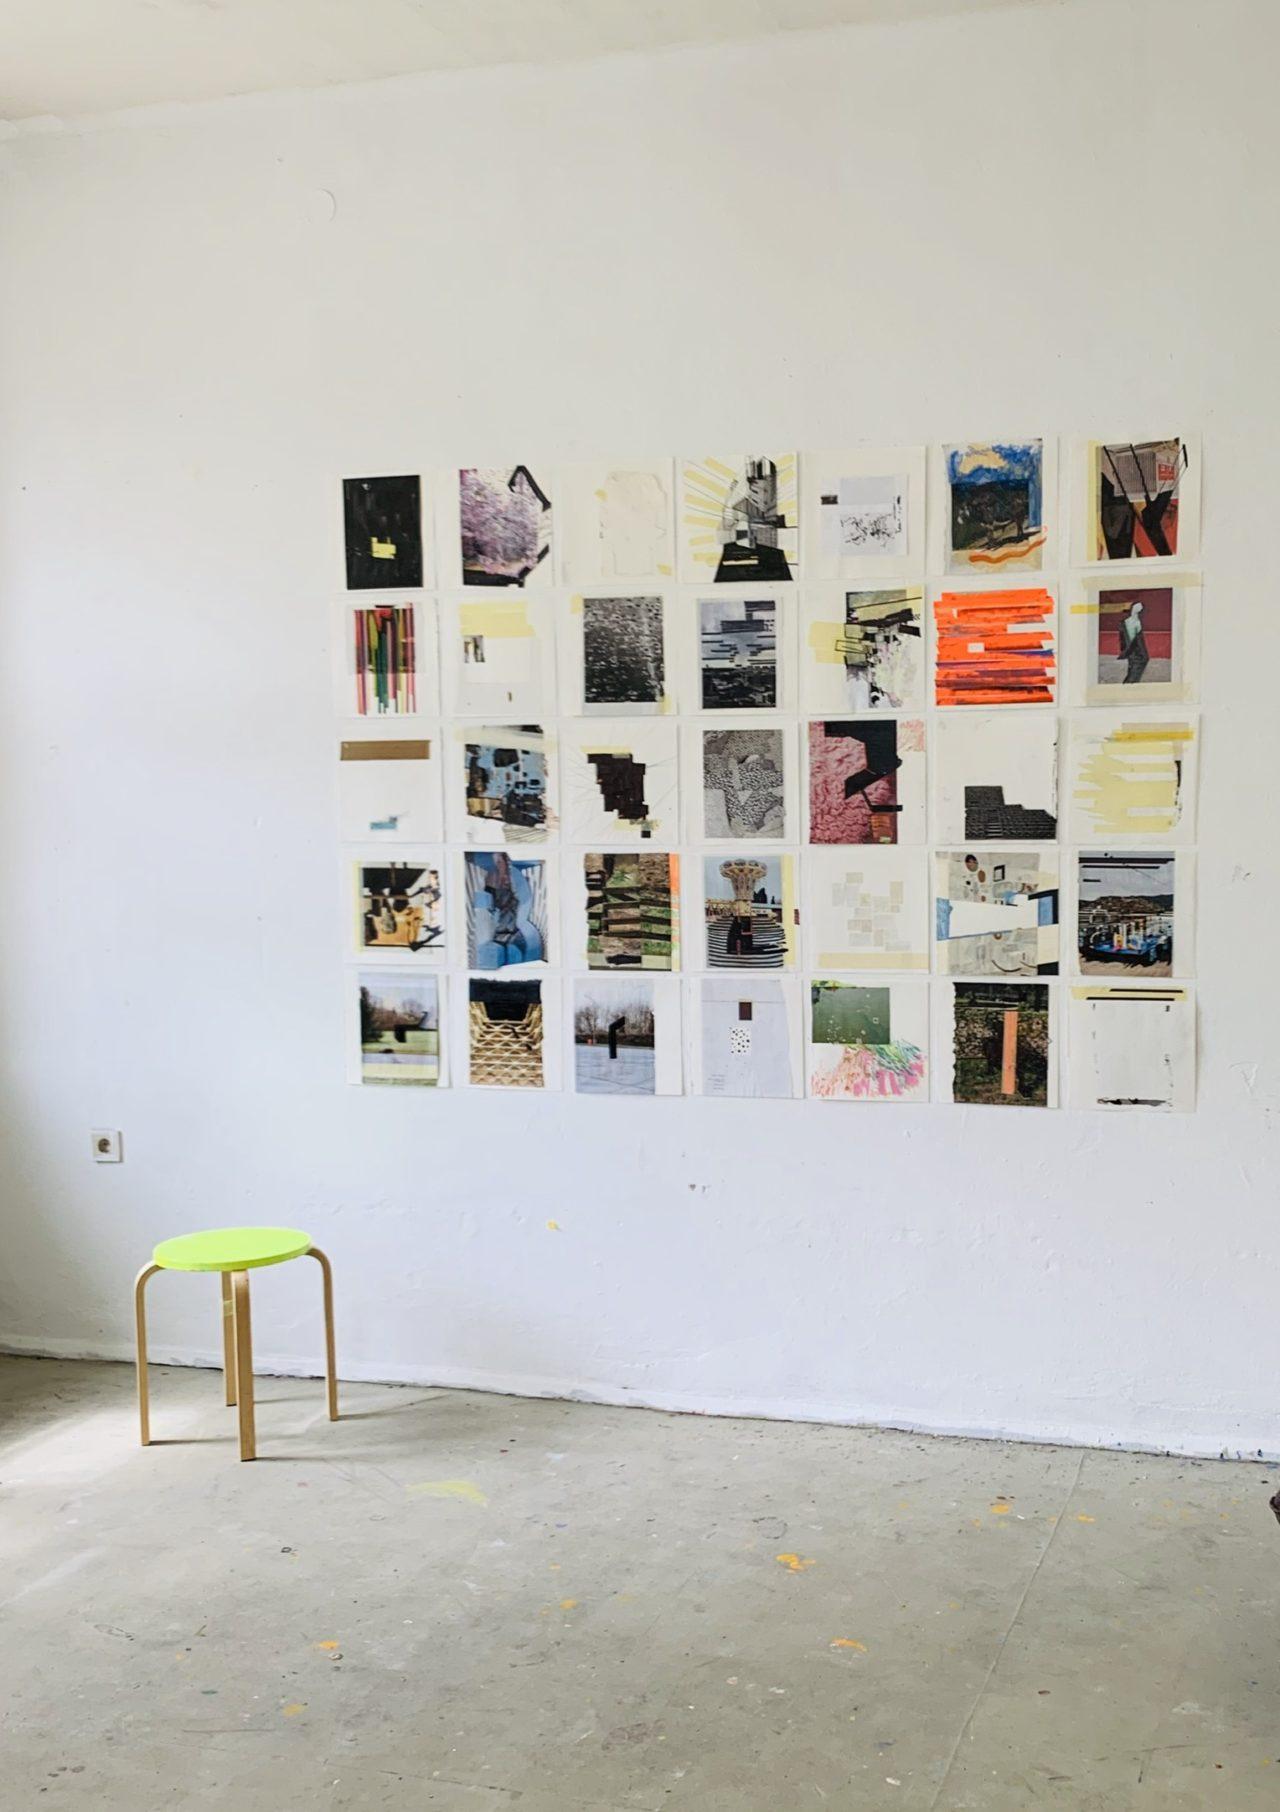 Opening Studio, 5.5.2019